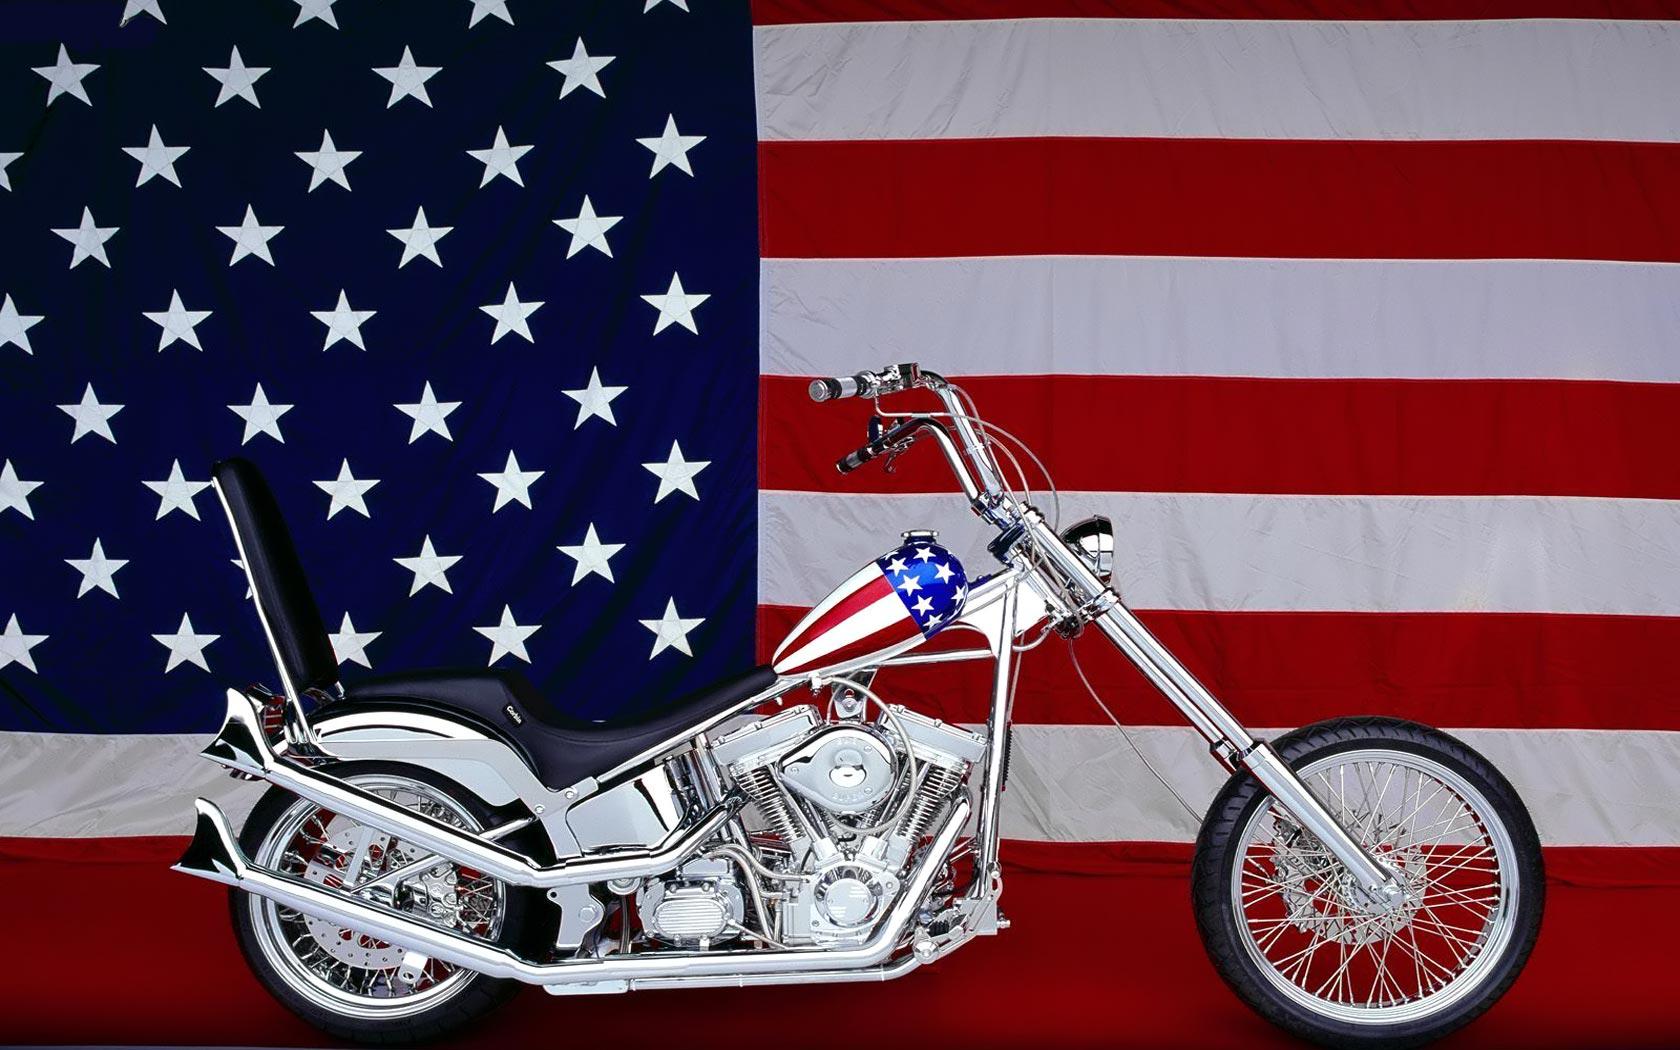 Harley Davidson hd Wallpaper High Quality WallpapersWallpaper 1680x1050